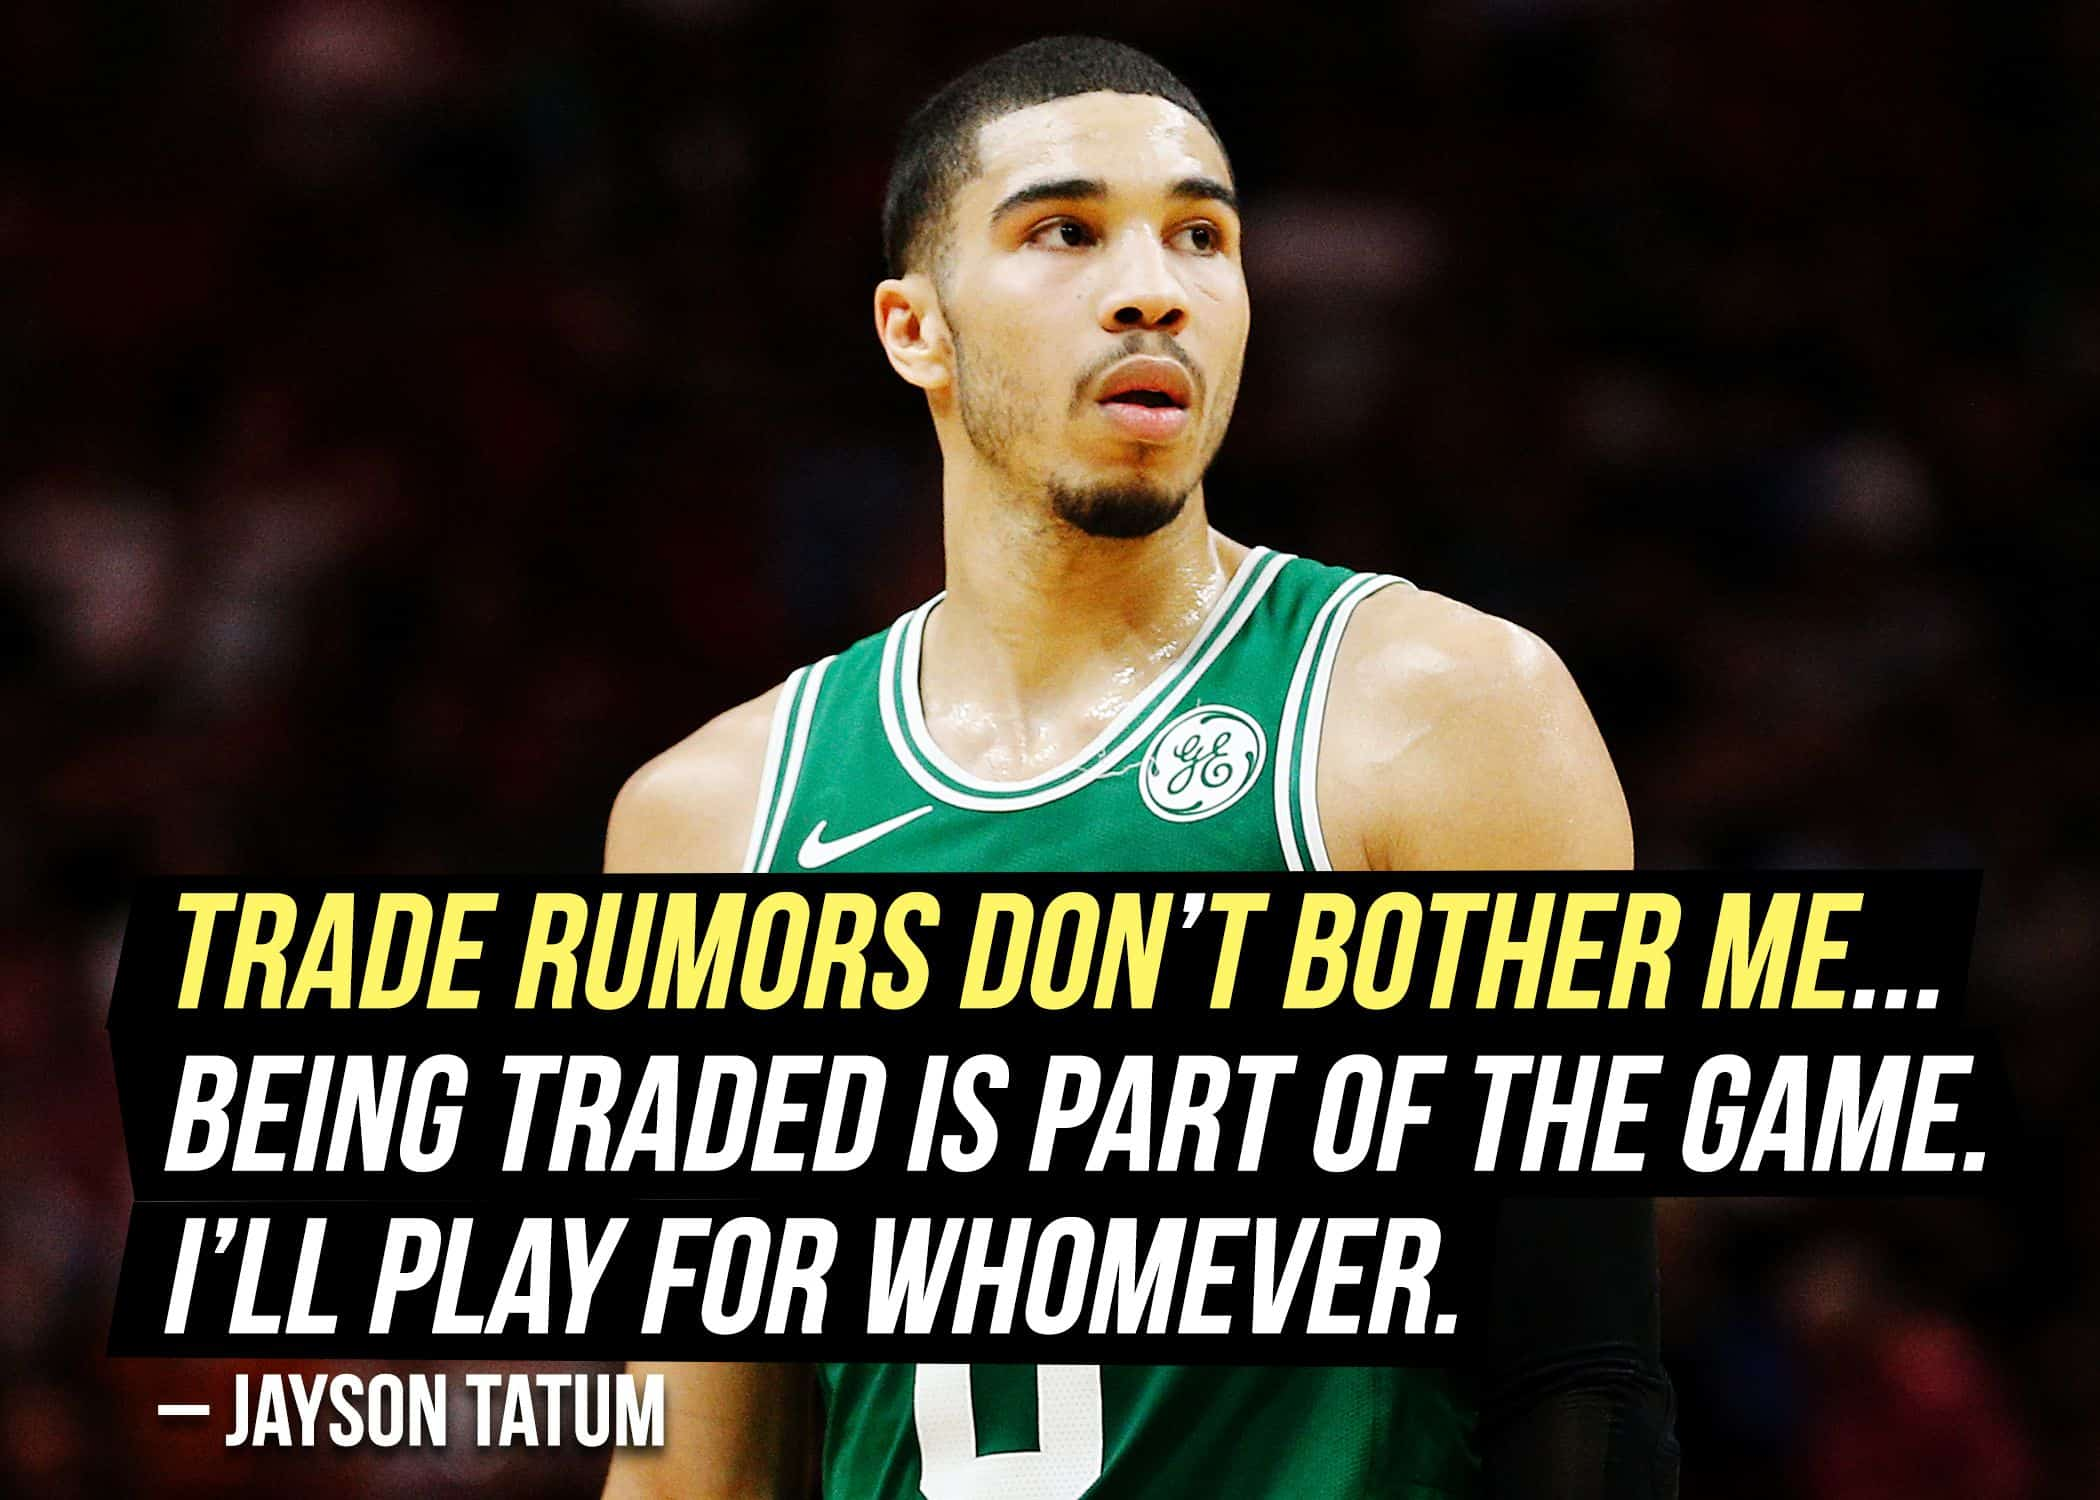 Jayson Tatum quote on rumors